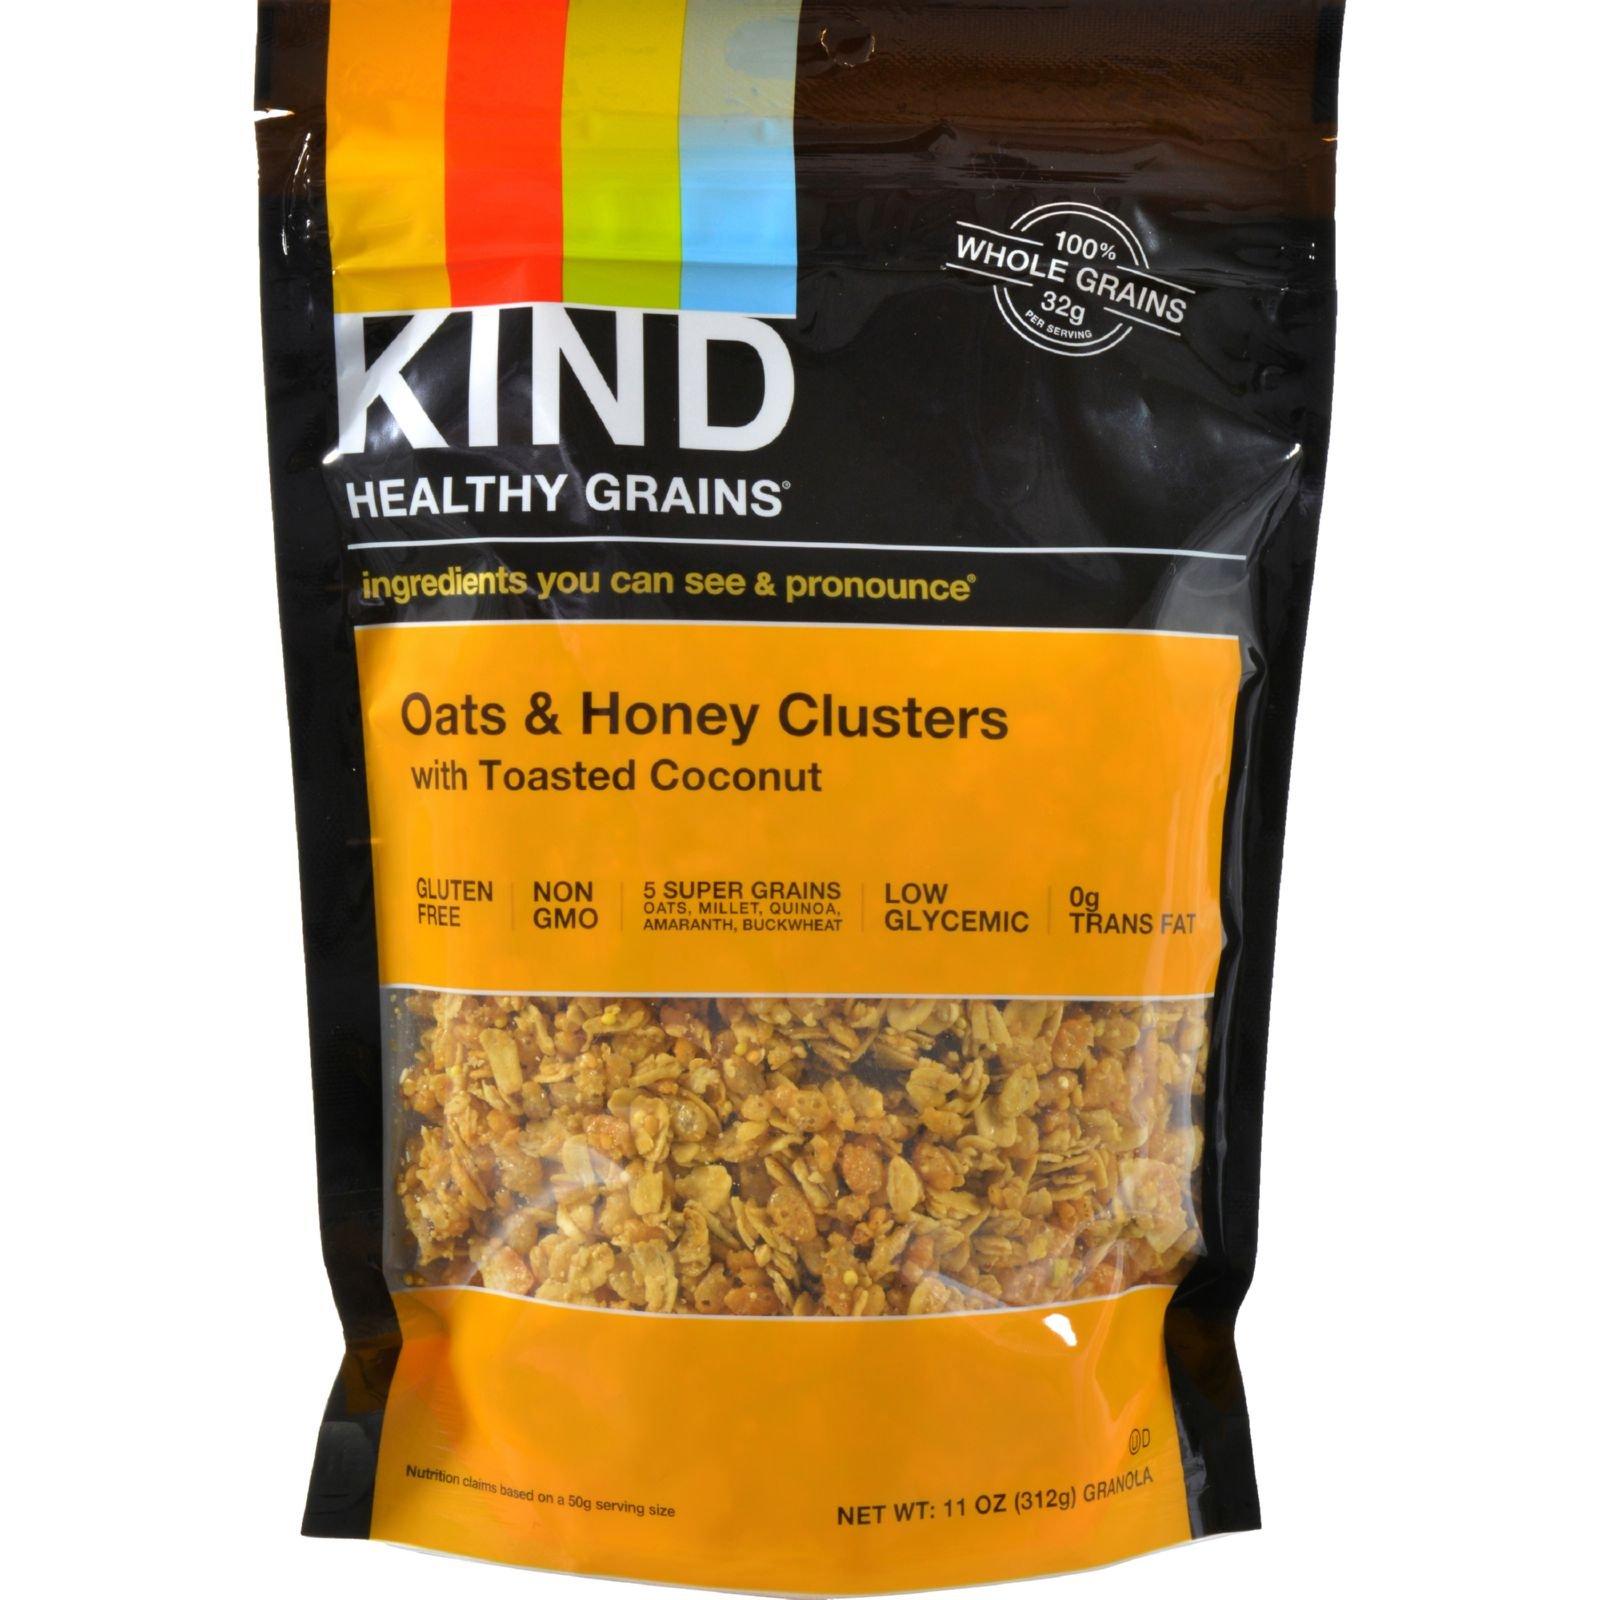 Kind Healthy Grains oats